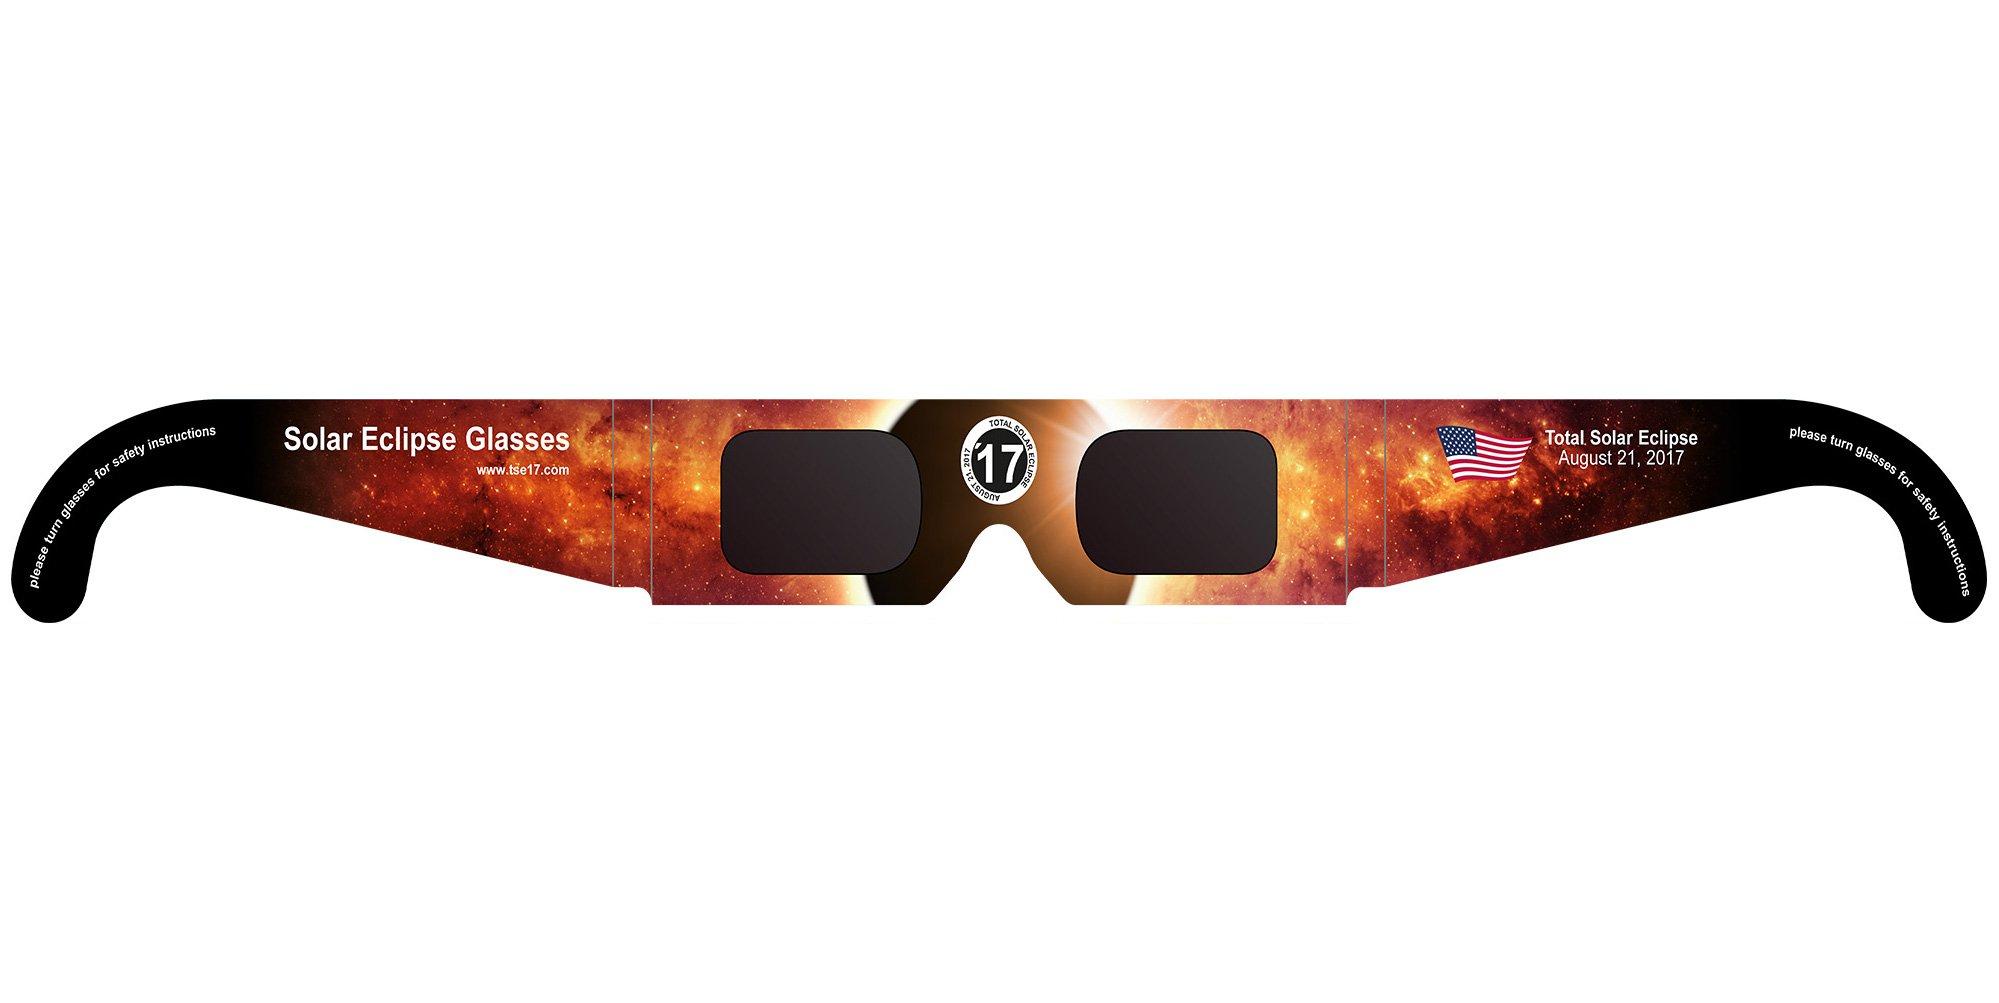 Sunfilter Glasses (Eclipse Glasses, 10-Set) by TSE17, Total Solar Eclipse 2017. …